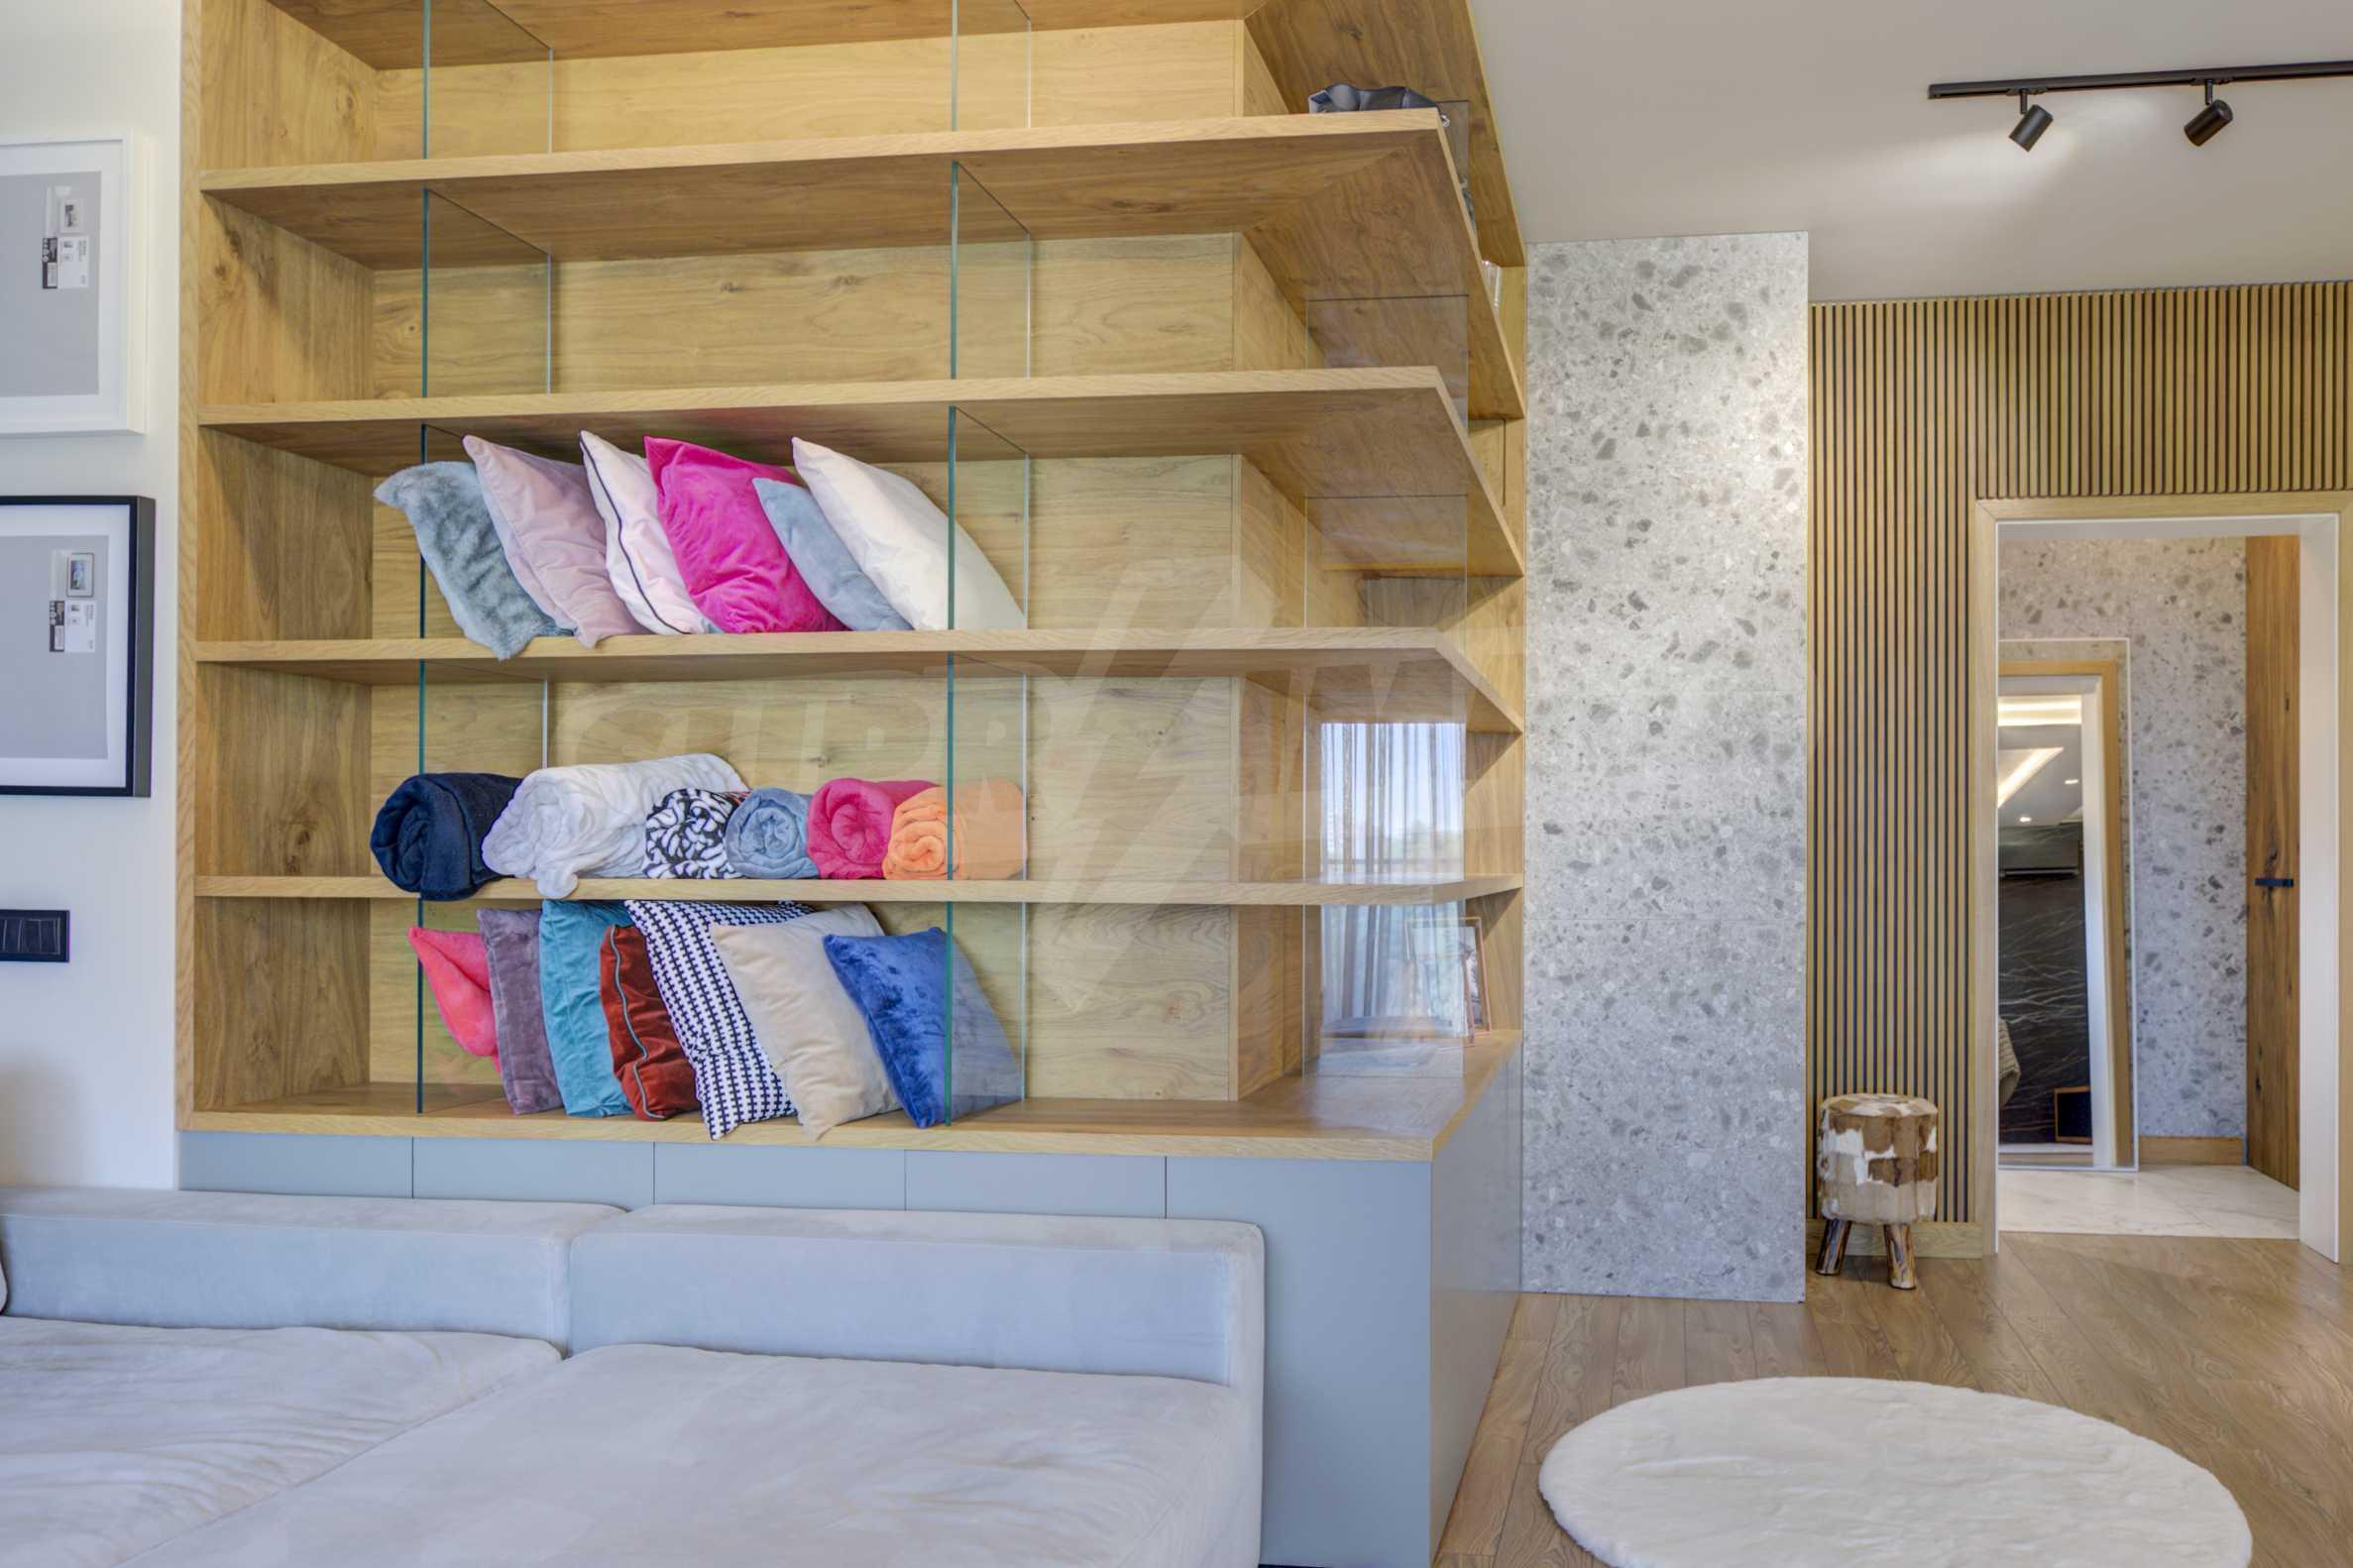 Дизайнерски обзаведен многостаен апартамент 7